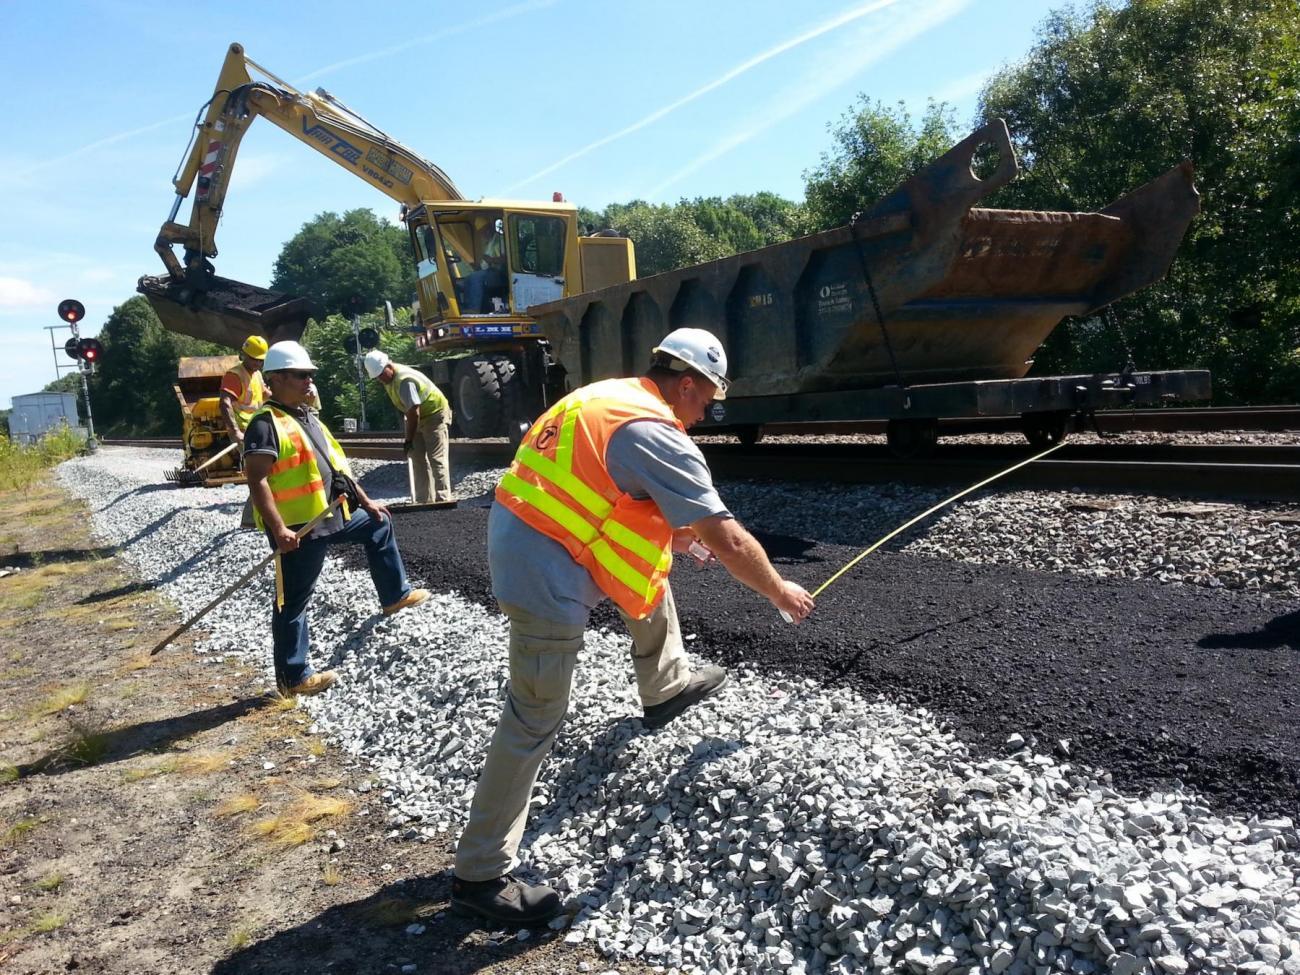 A worker lays asphalt parallel to the tracks, near the Merrimack River Bridge.